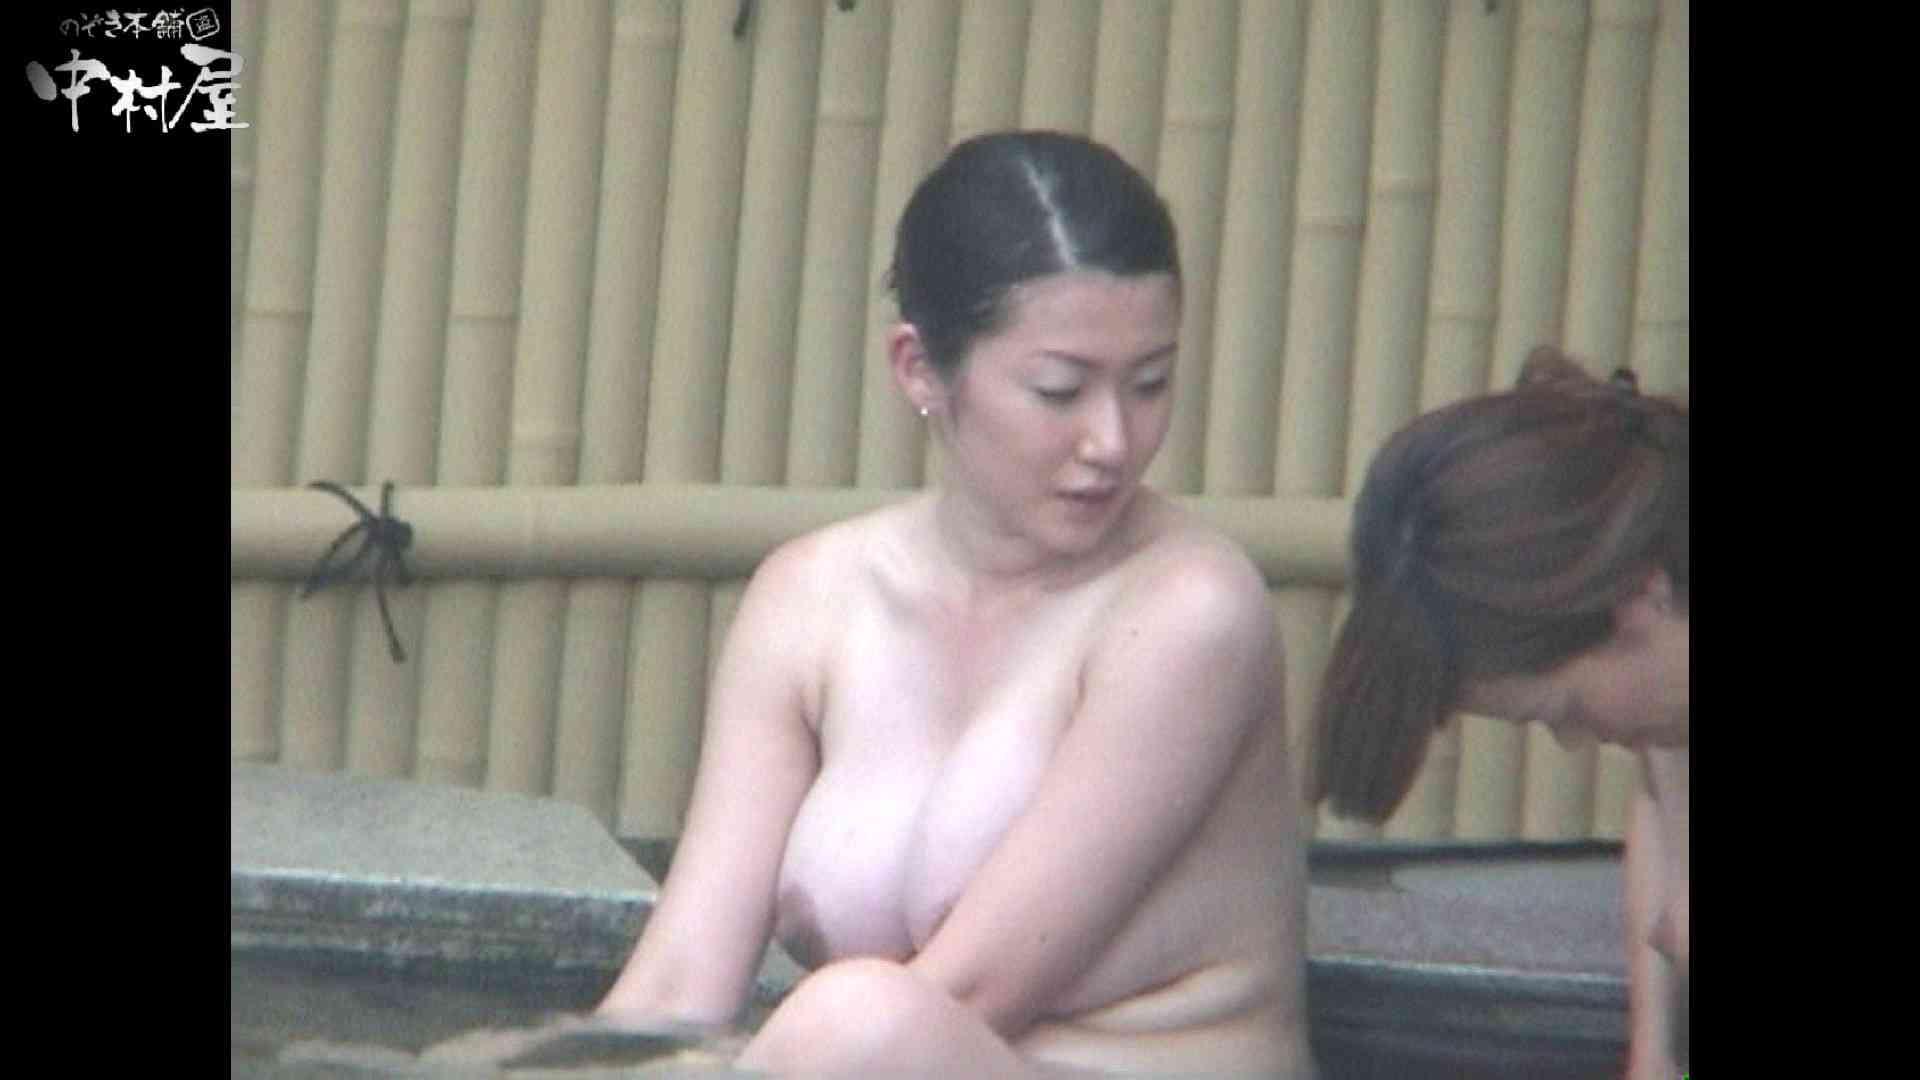 Aquaな露天風呂Vol.961 露天風呂 | OLのエロ生活  104連発 103